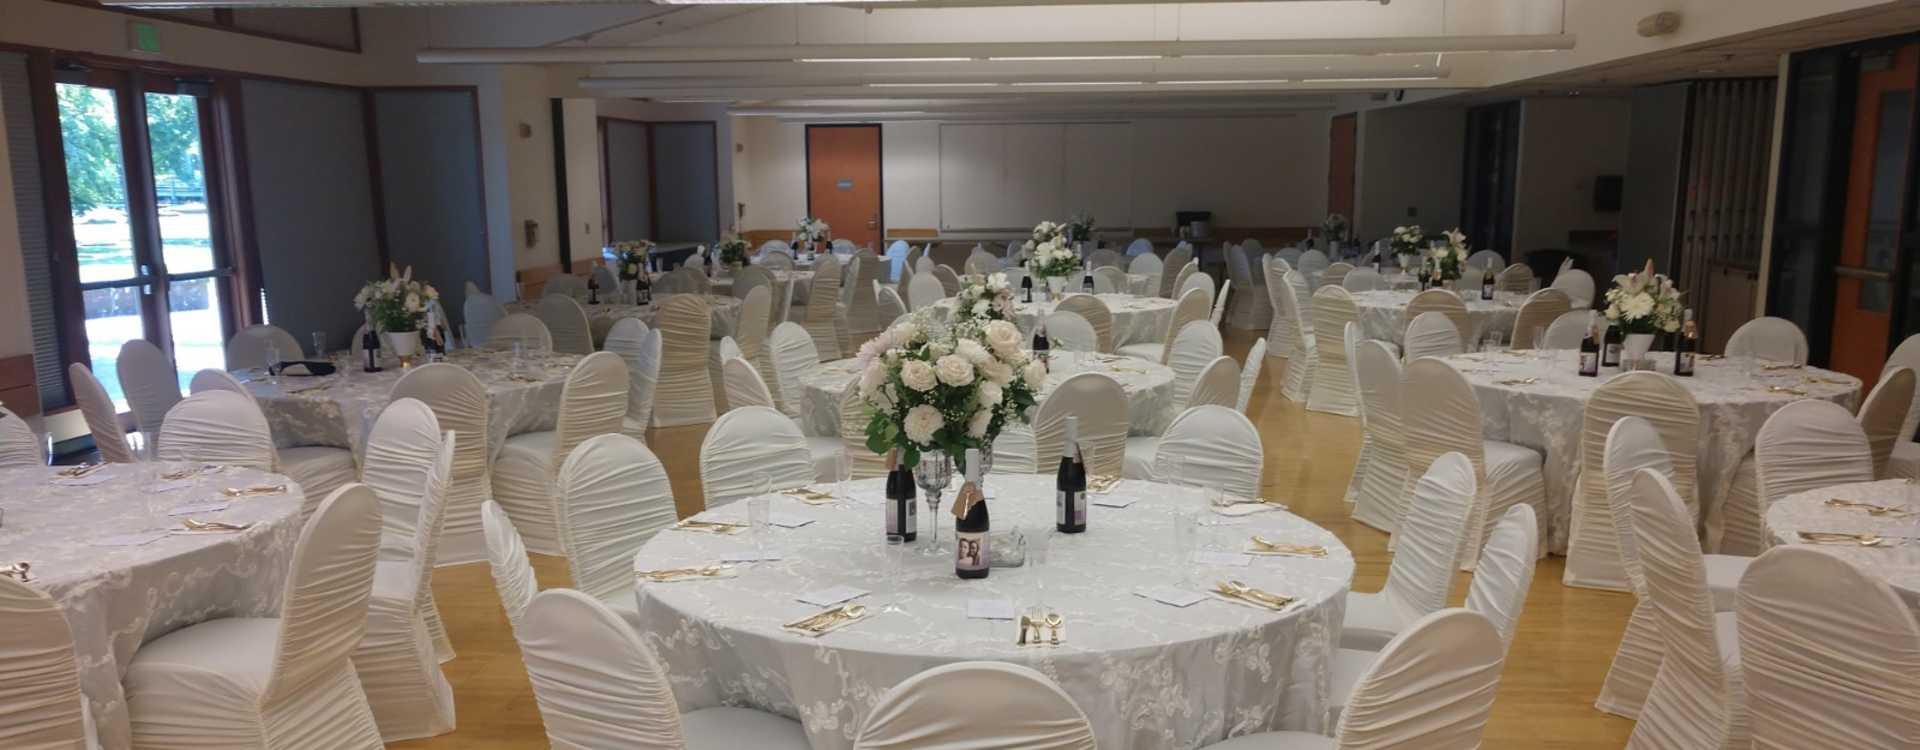 Banquet setup at a social or wedding event at Tukwila Community Center